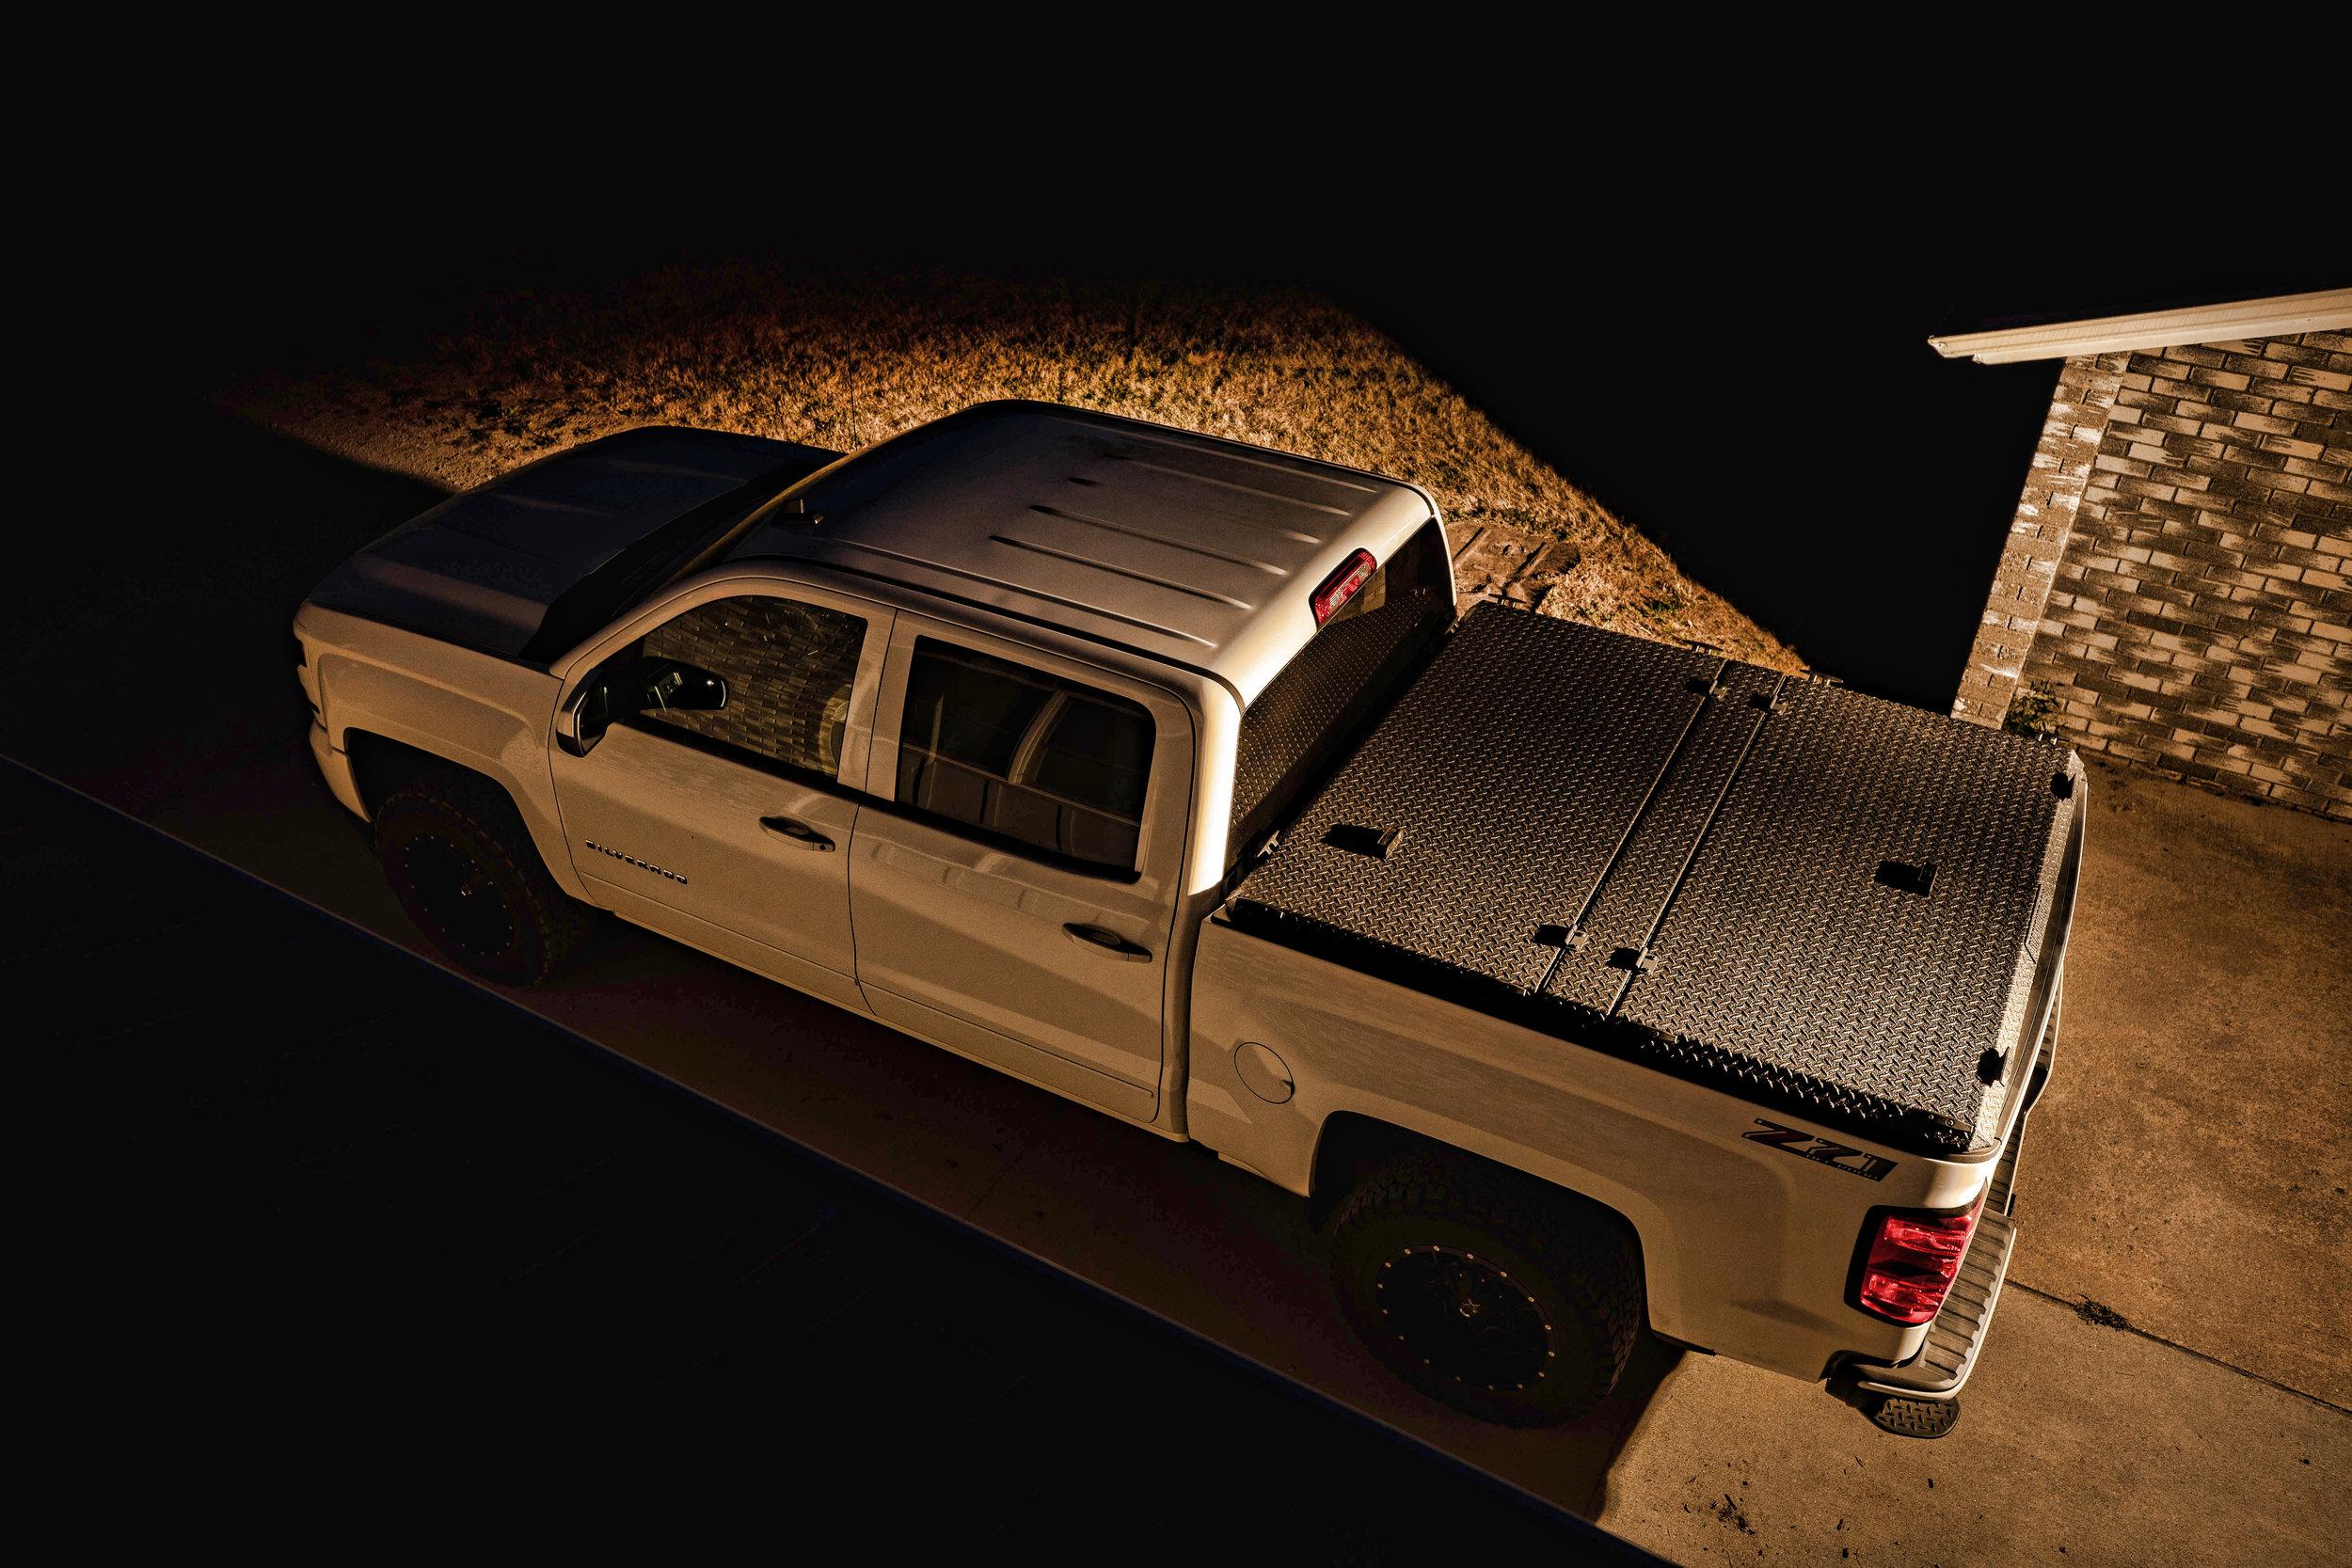 diamondback-hd-black-lifestyle-side-overhead-driveway-dark.jpg